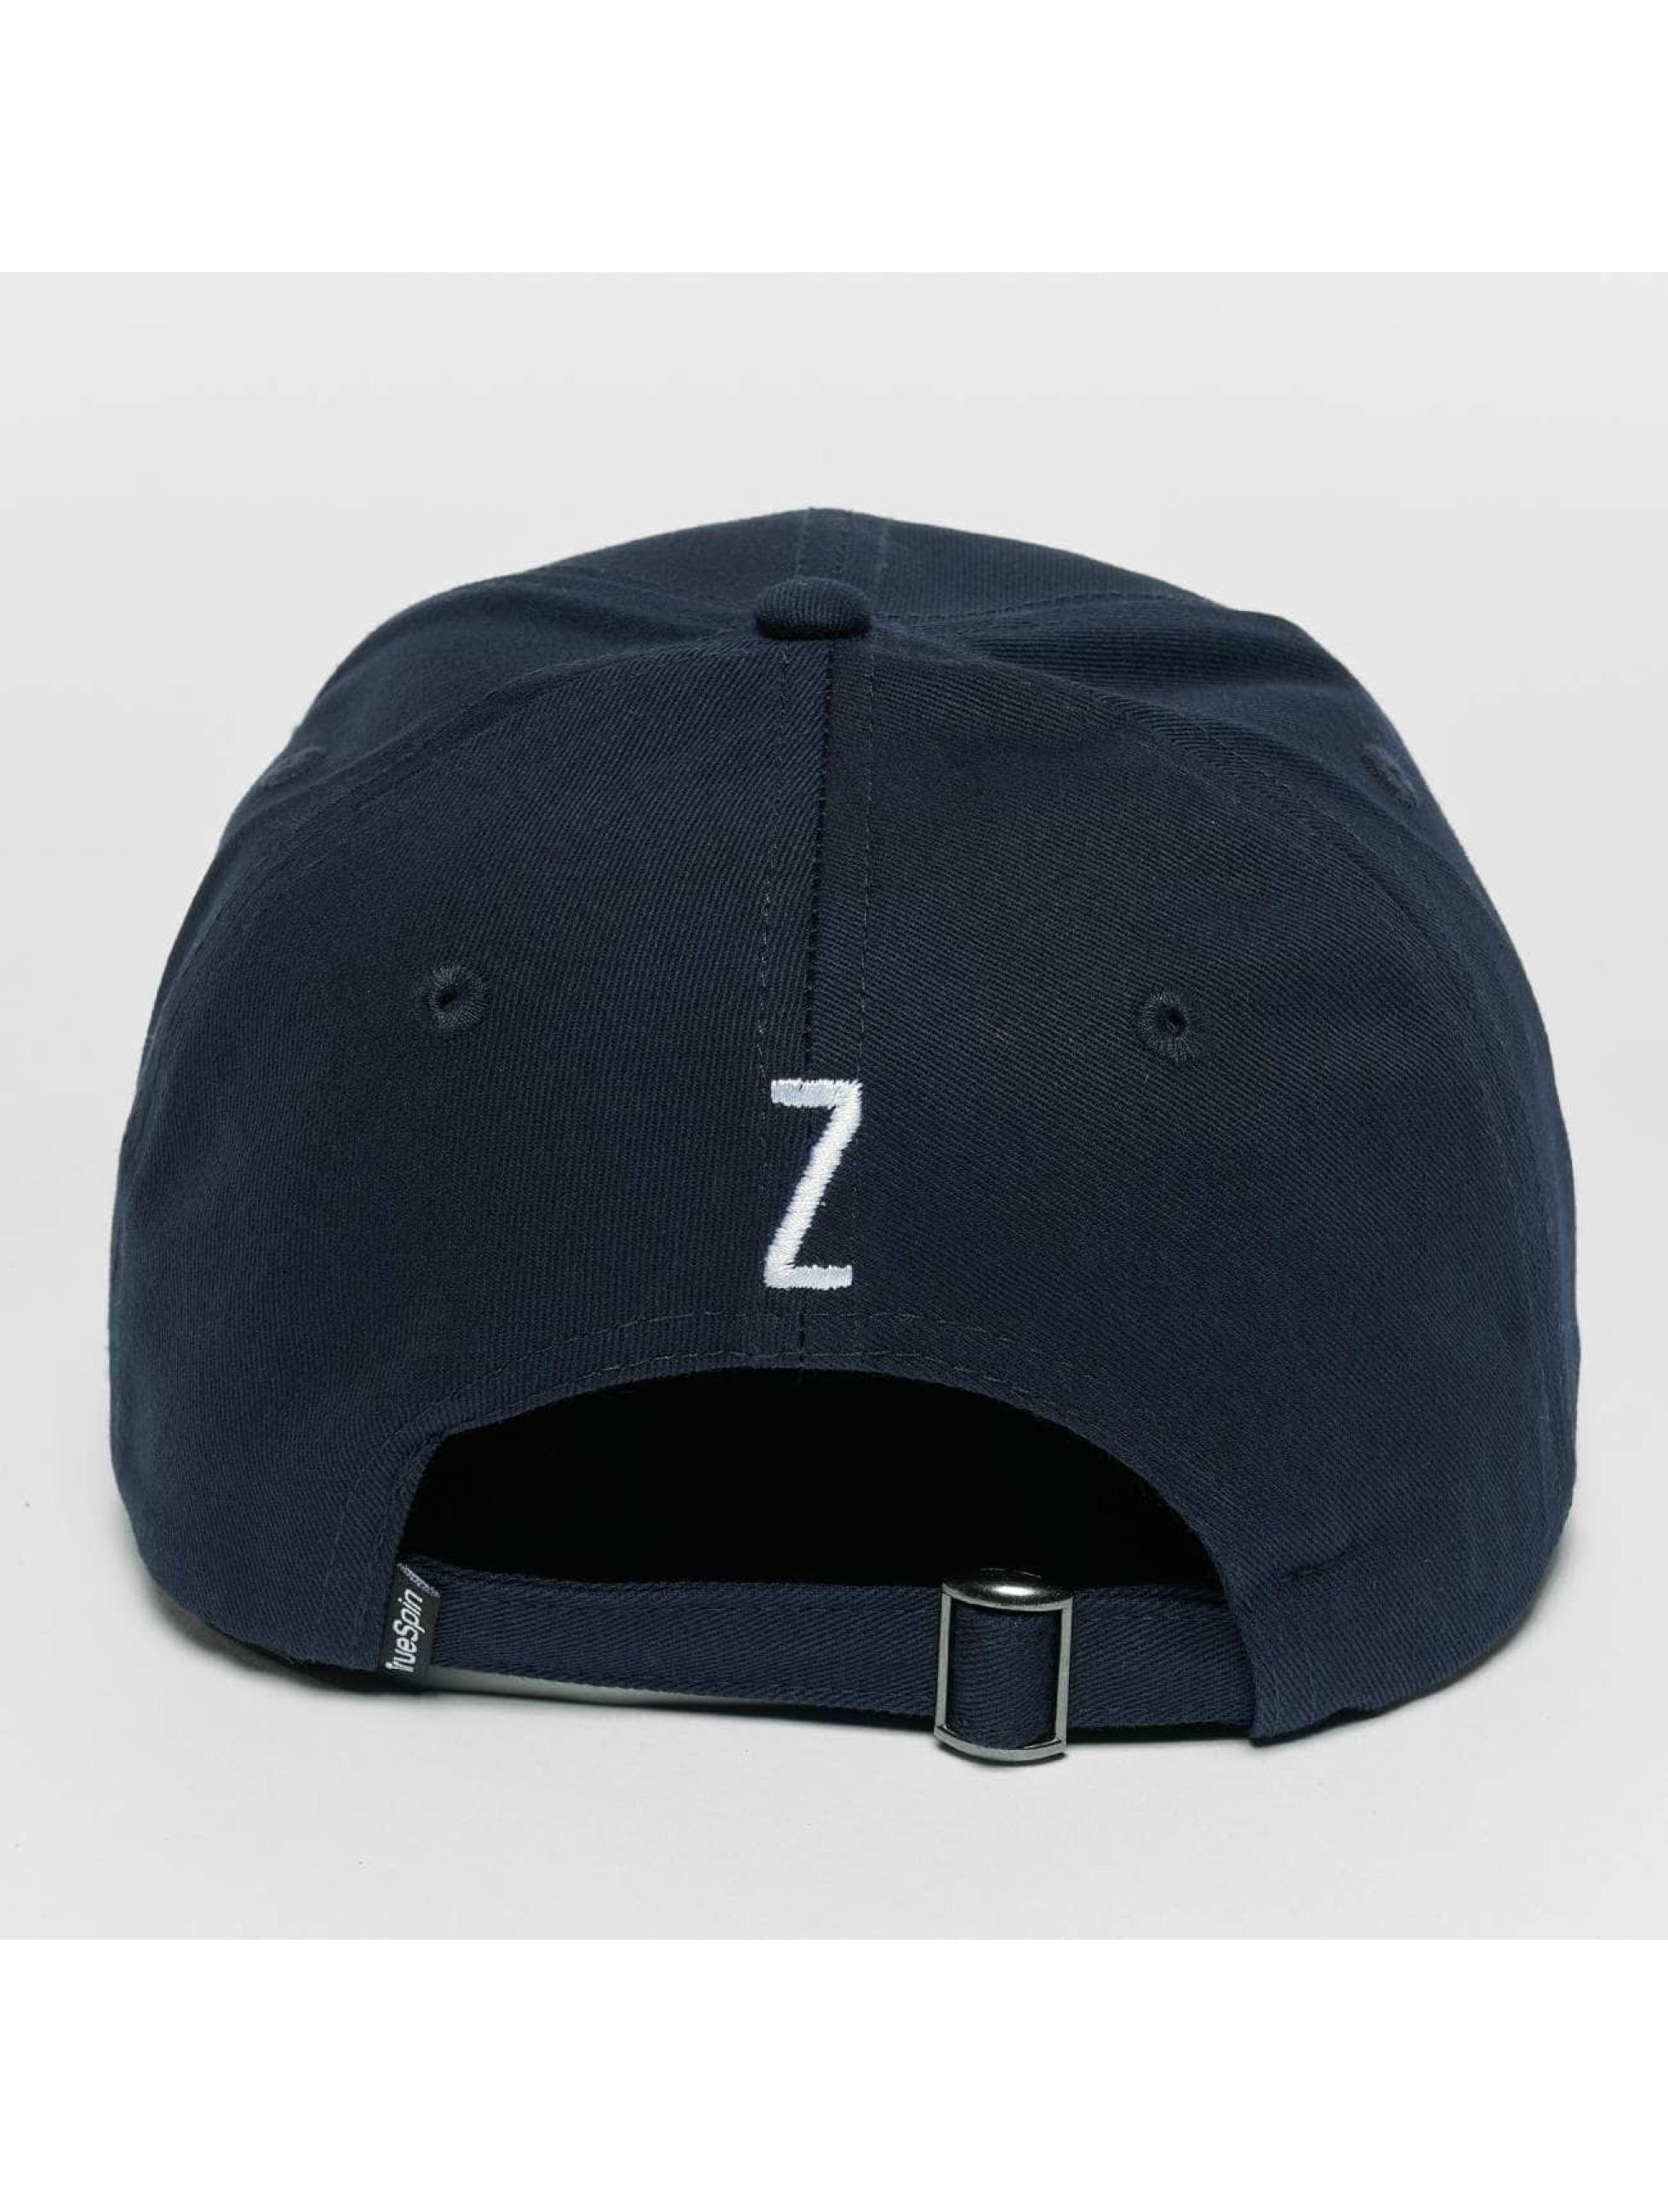 TrueSpin Casquette Snapback & Strapback ABC Z bleu